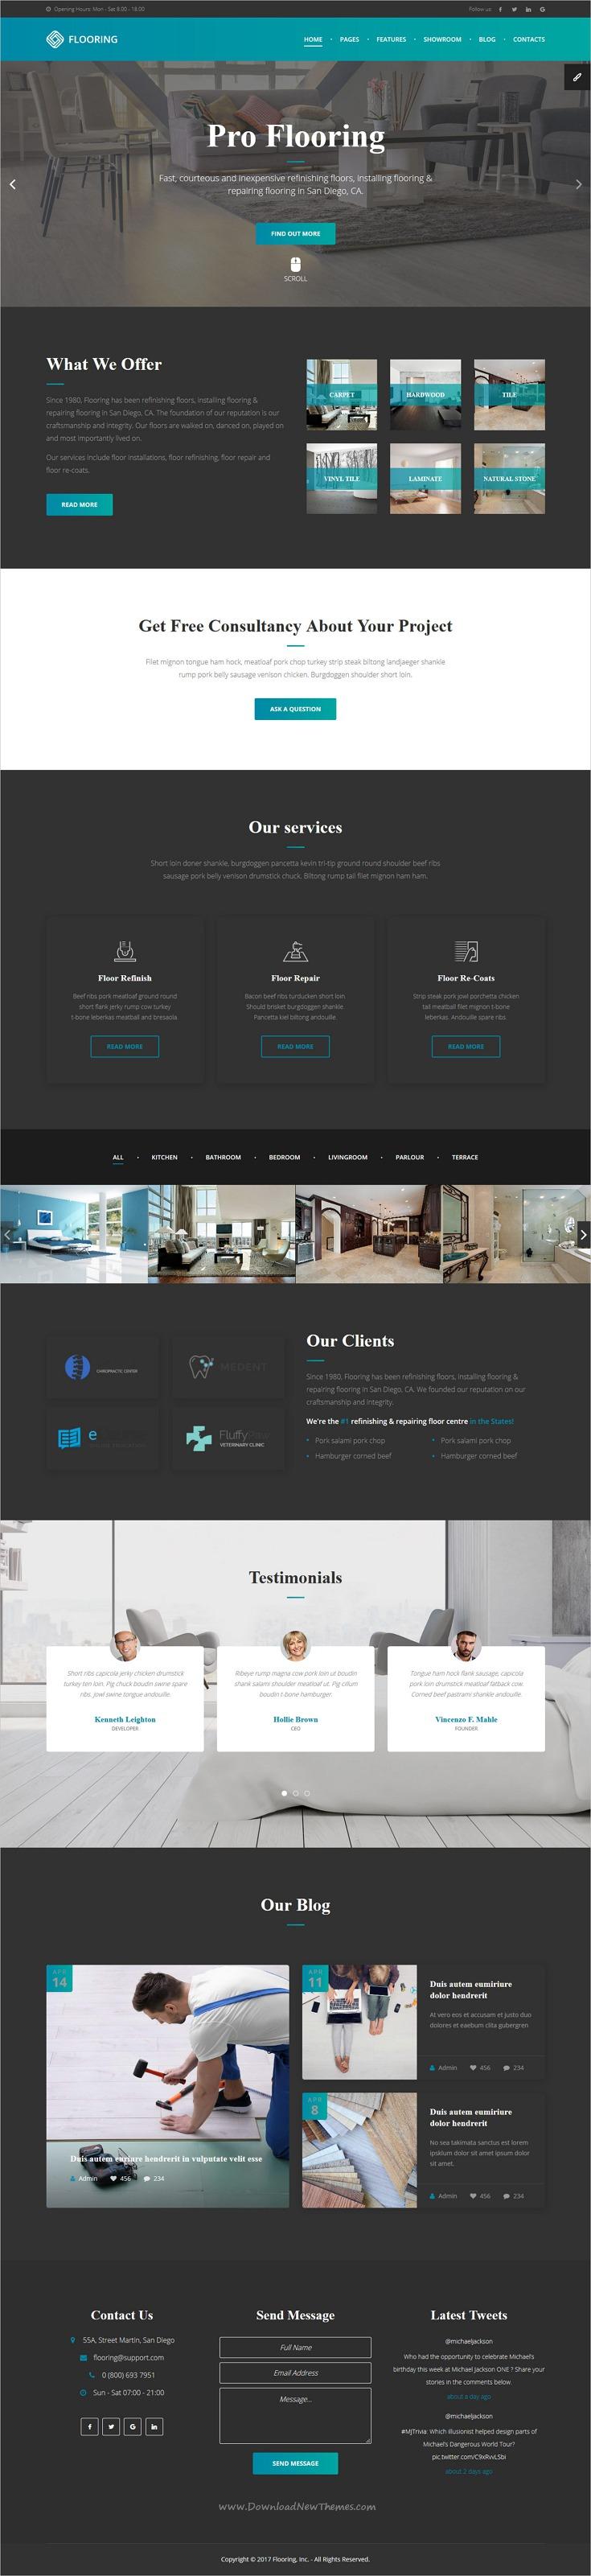 Flooring - Floor Repair / Refinish HTML Template with Visual ...